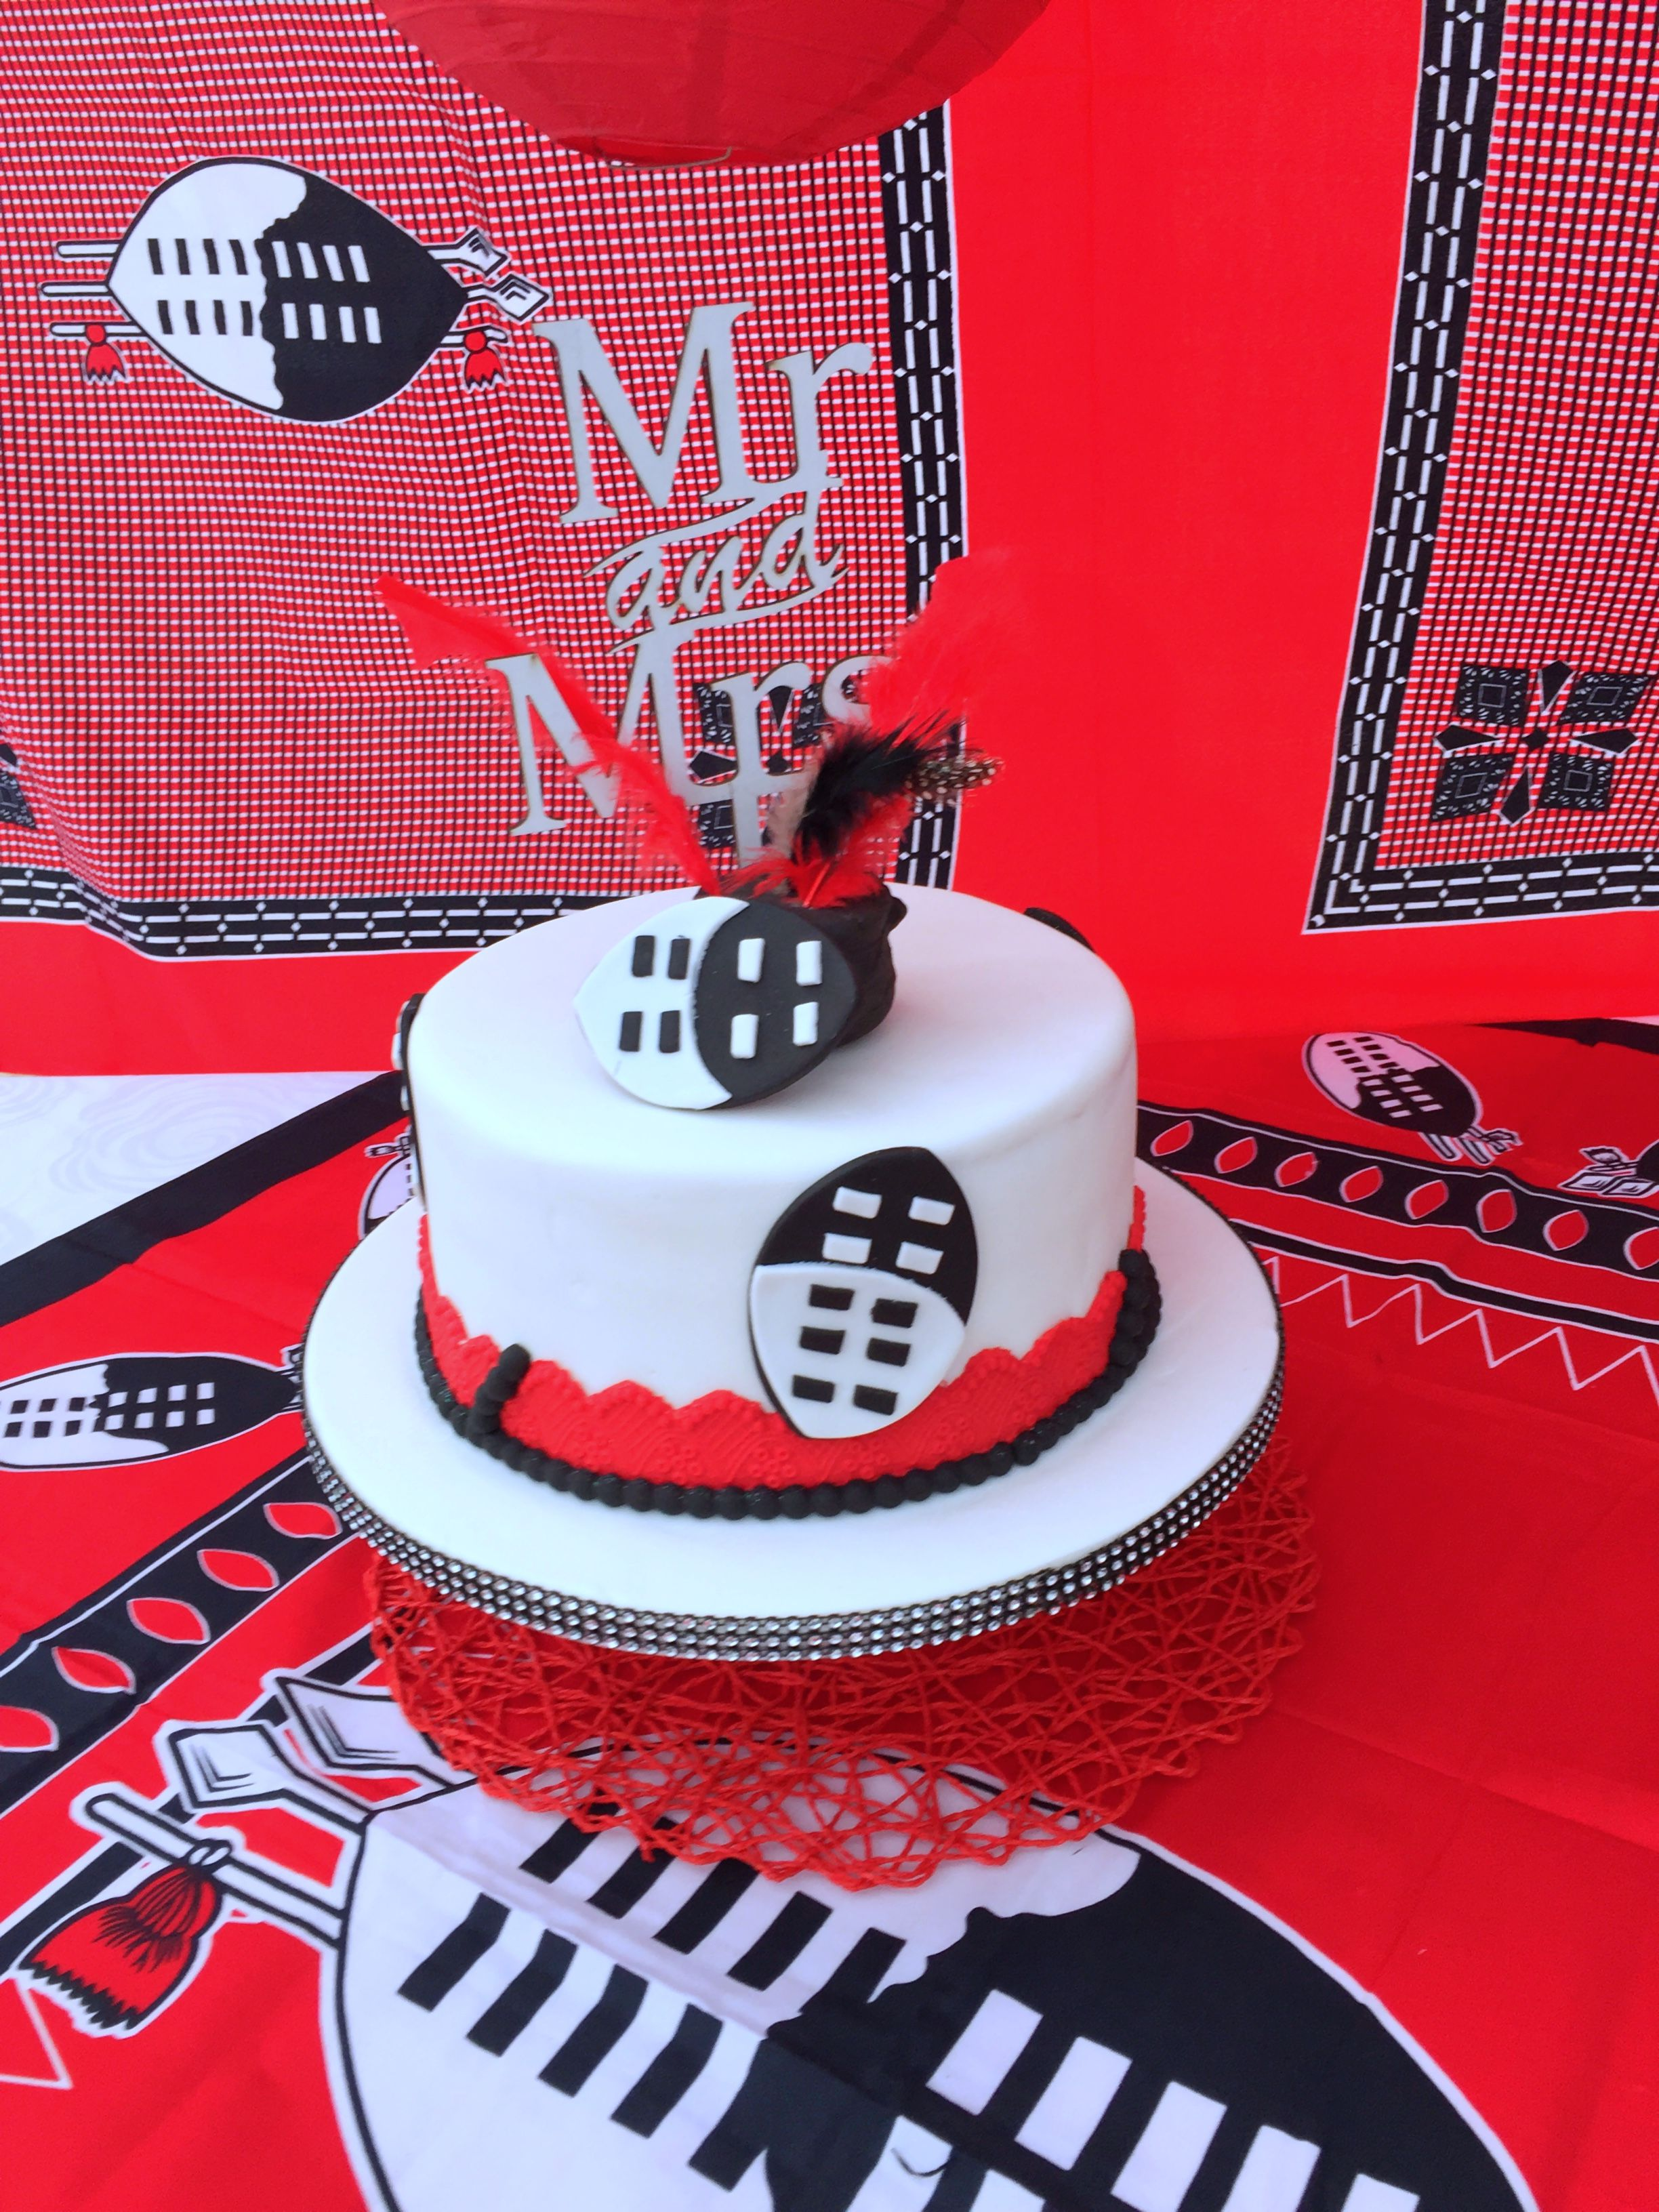 10 PIECE YELLOW BRIDESMAID AFRICAN FEMALE CAKE TOPPER DECORATING WEDDING BLACK